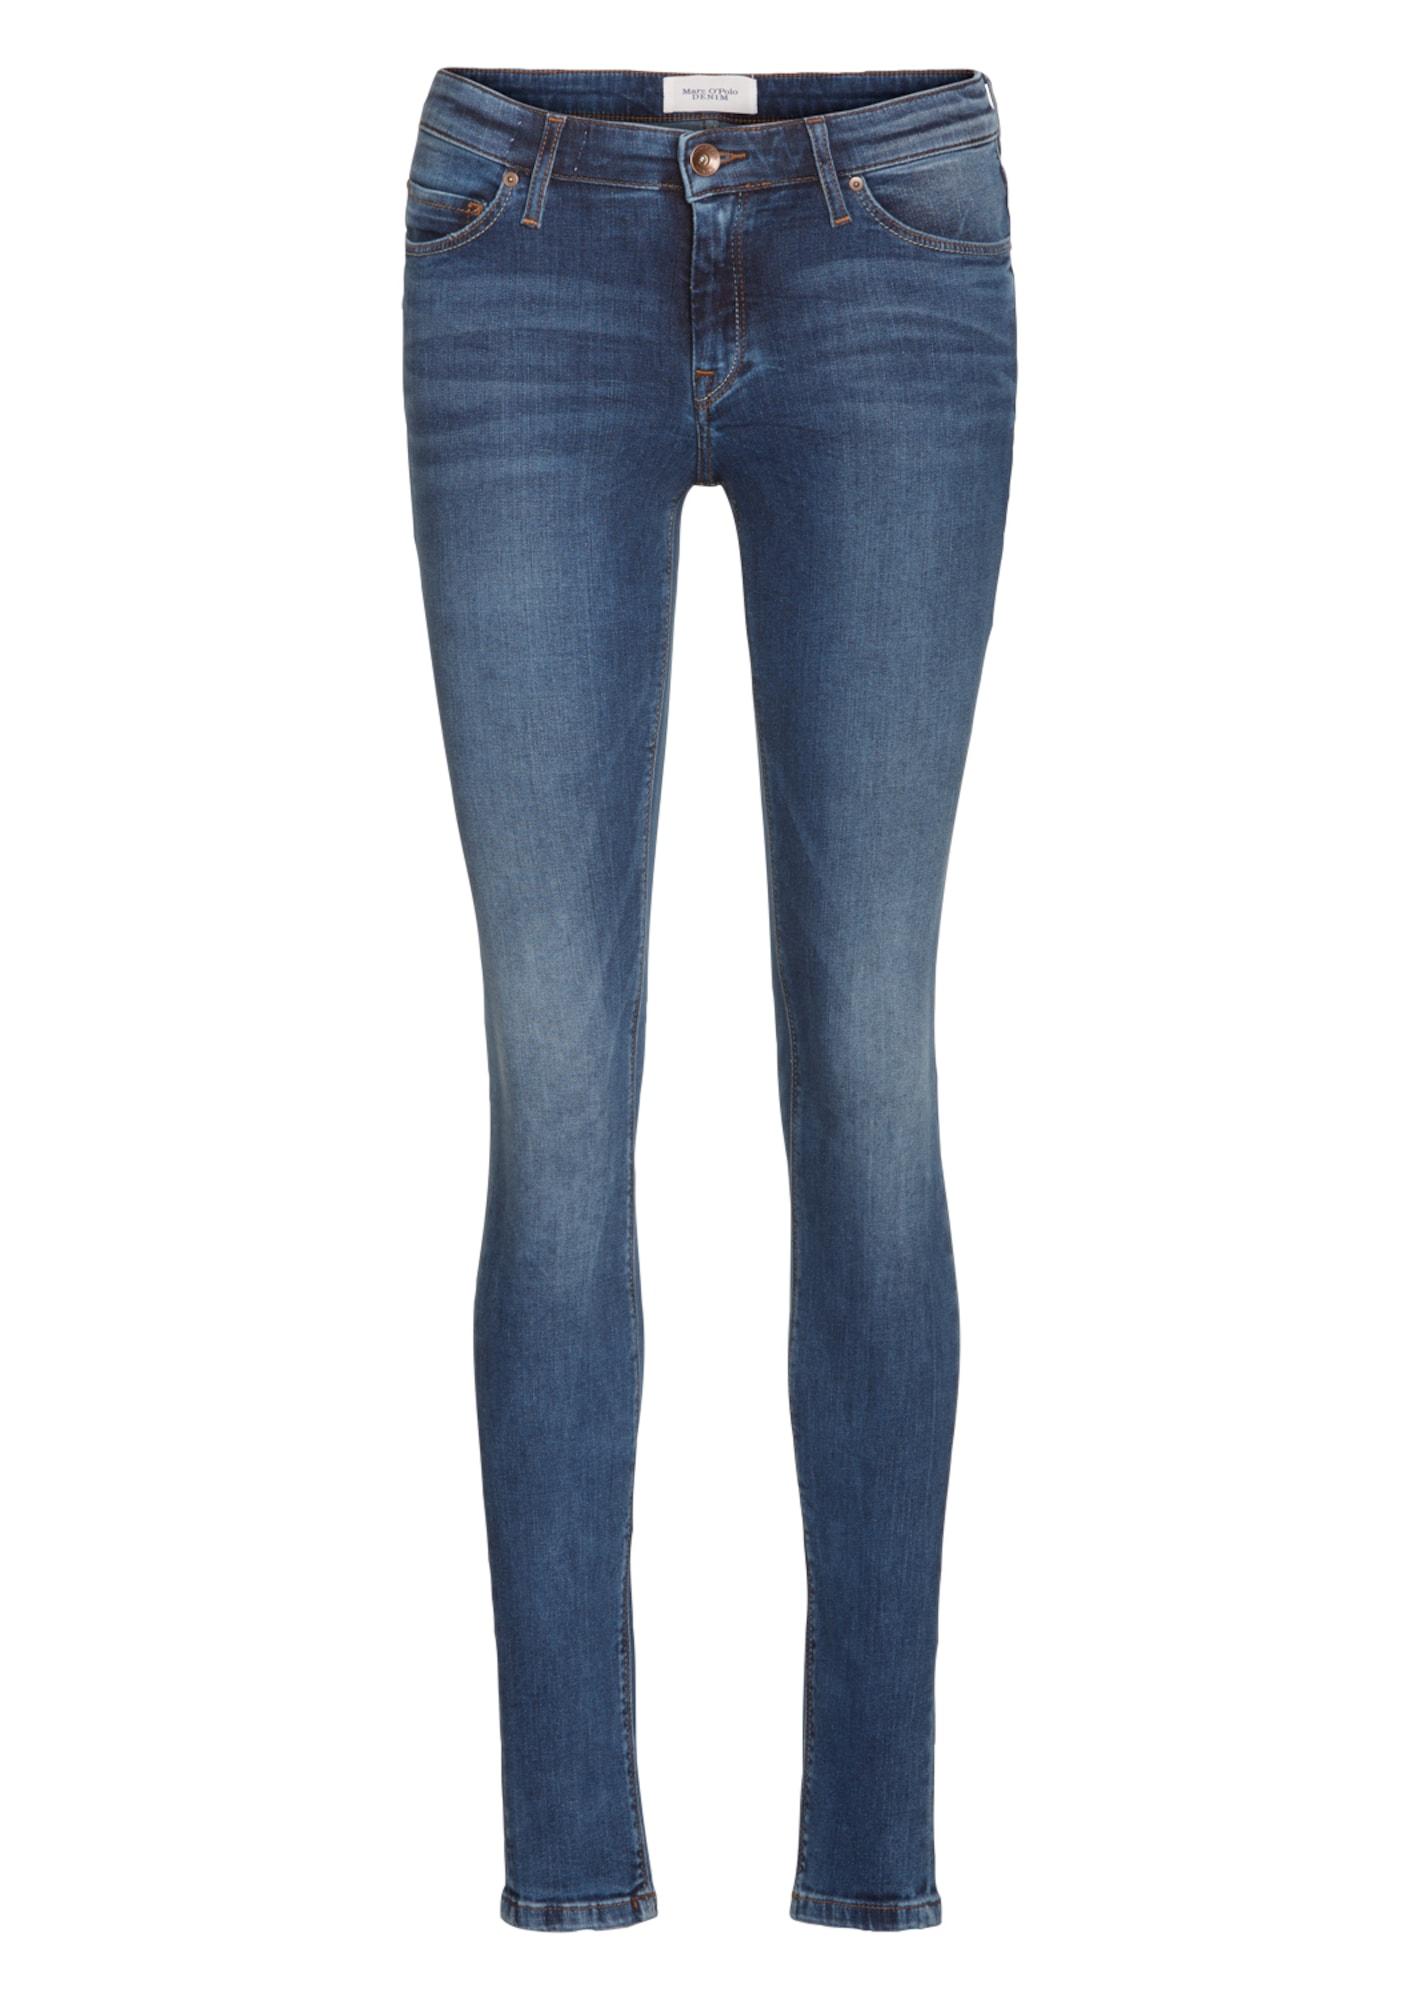 Jeans 'SIV'   Bekleidung > Jeans > Sonstige Jeans   Marc O'Polo DENIM